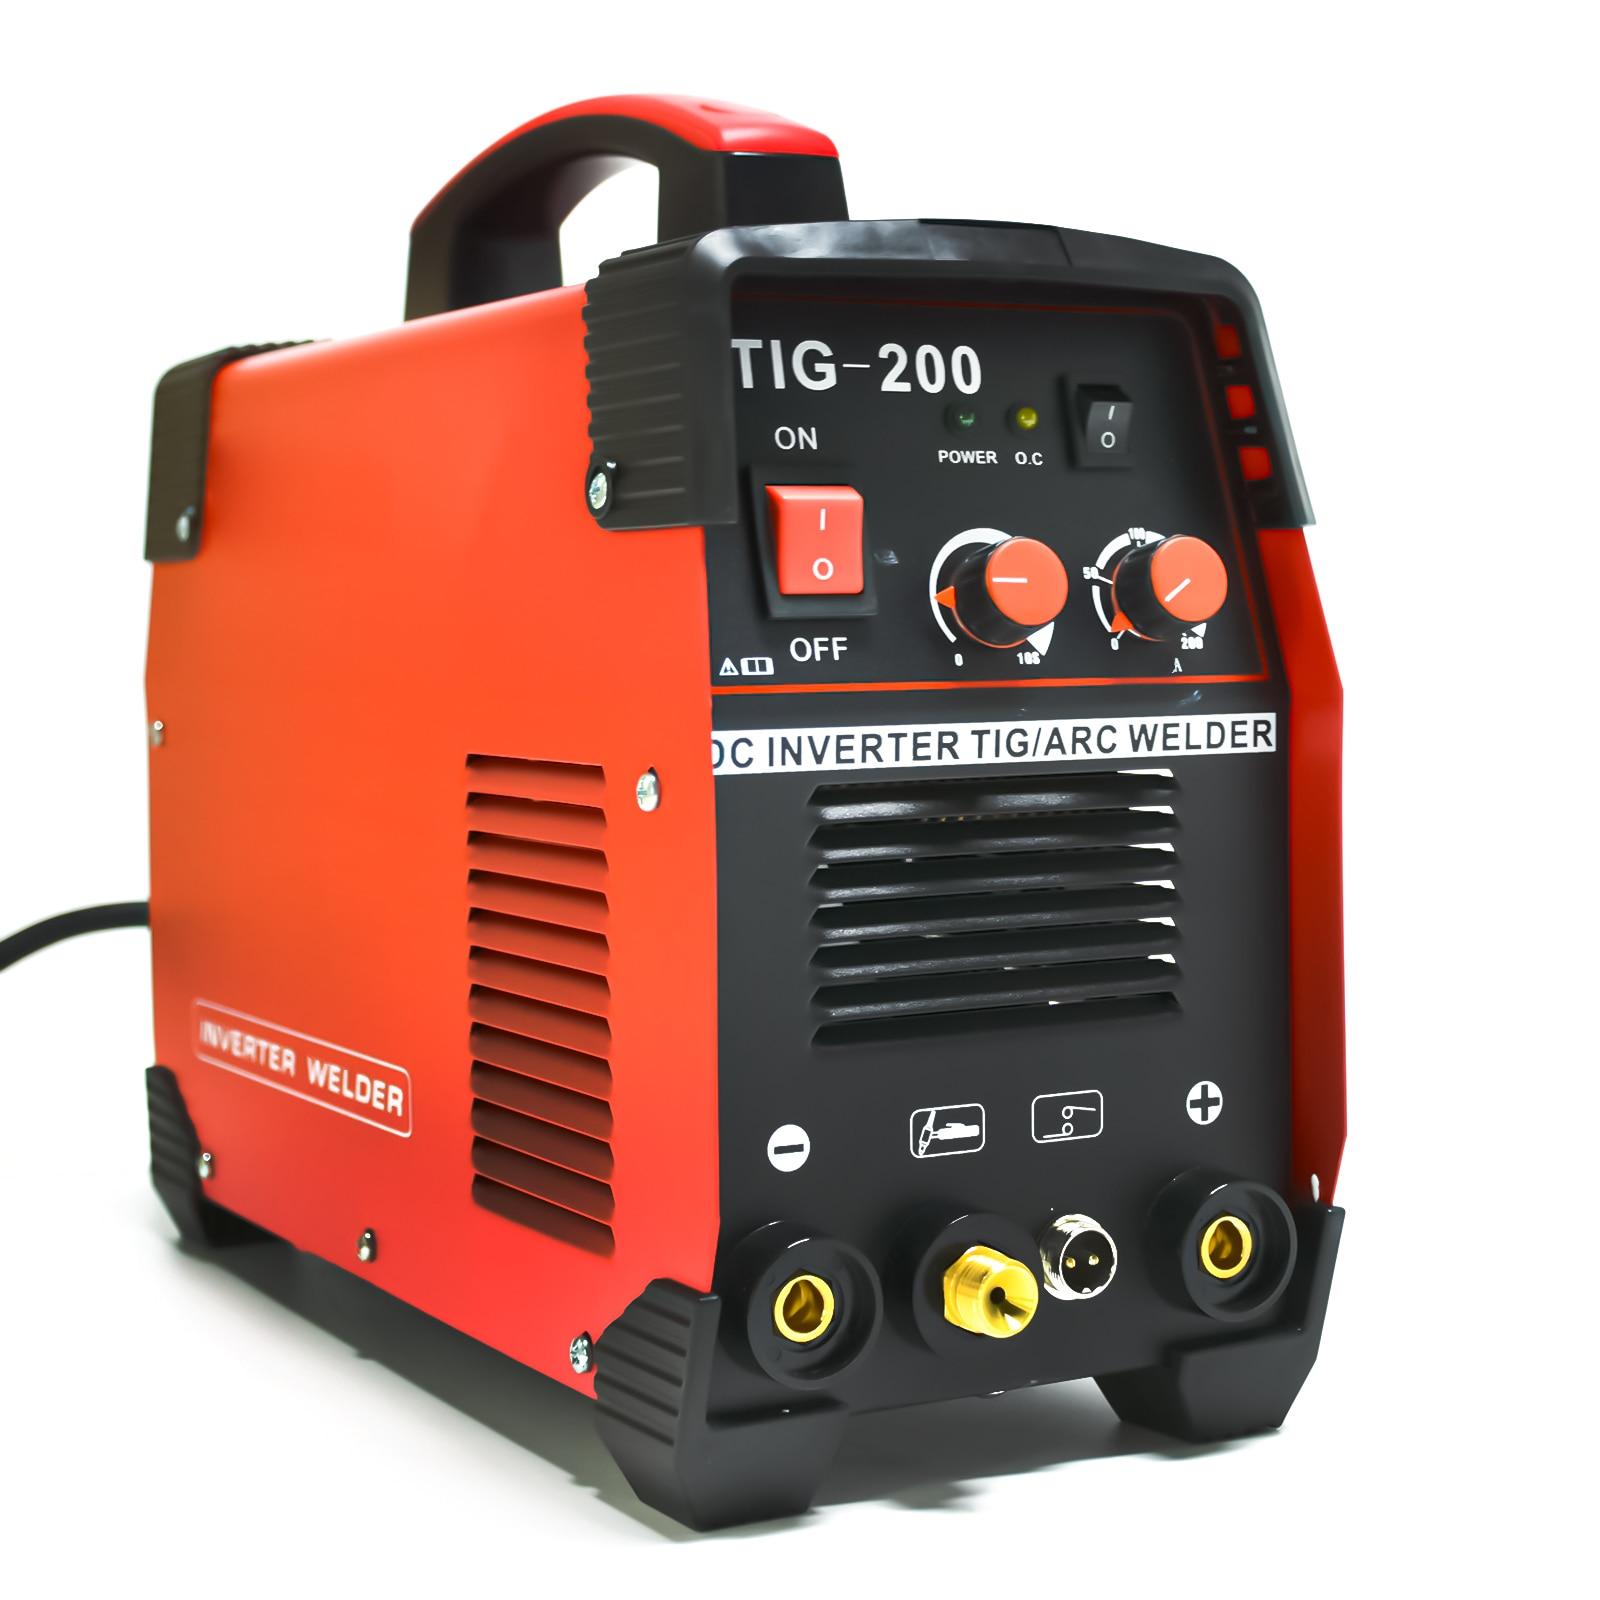 TIG Welder 200Amp Gas Equipment Mini Portable Inverter pulse Machine Welding Soldering IGBT Spot Welder MMA Inverter